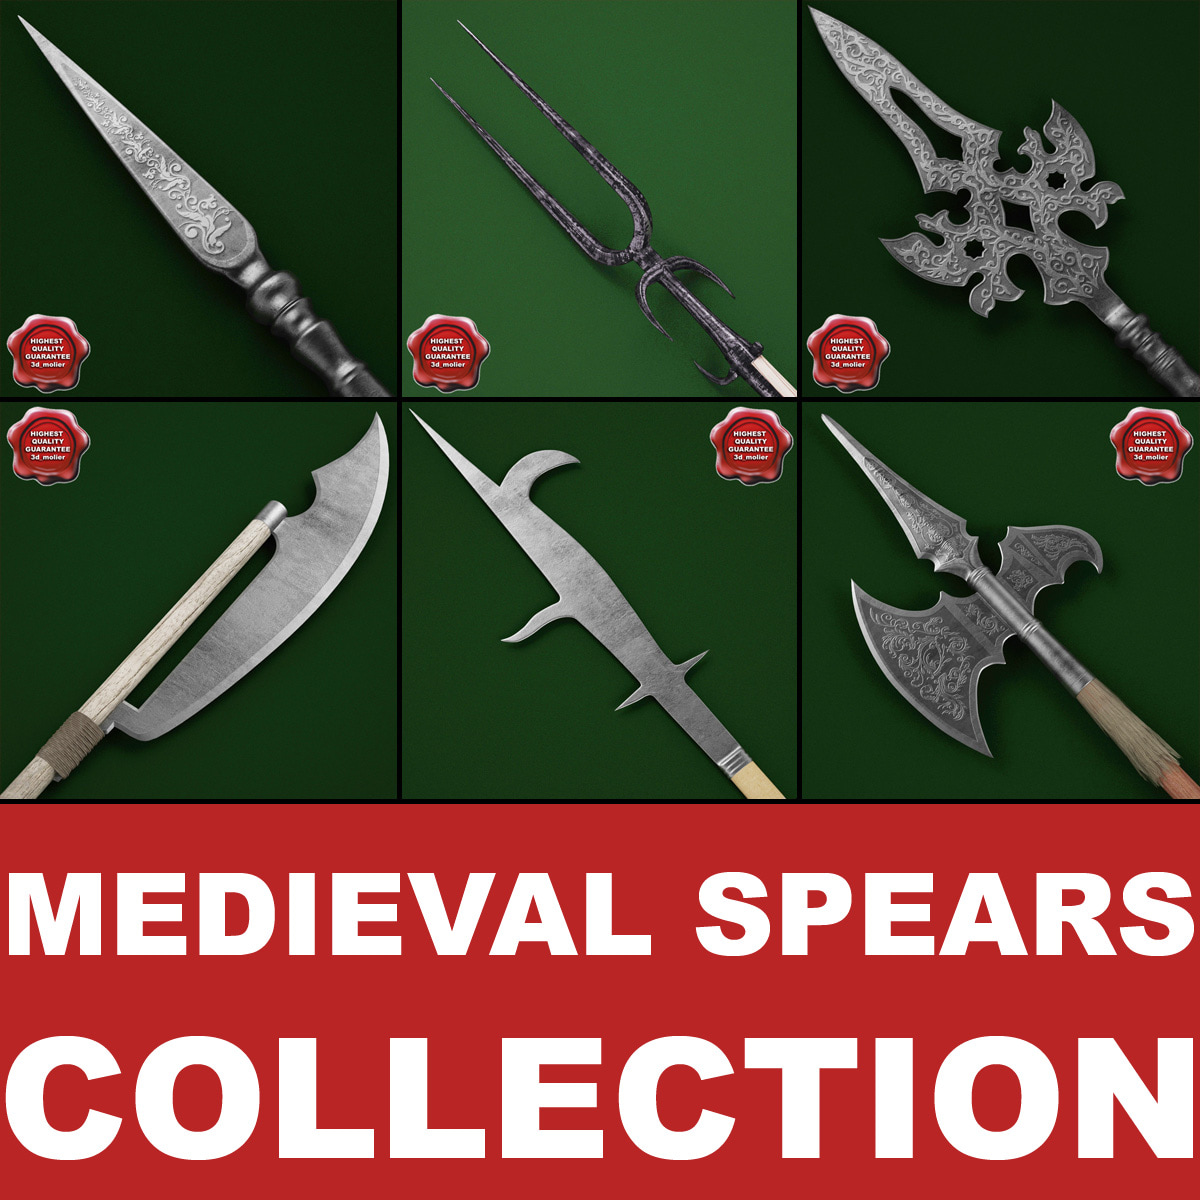 Medieval_Spears_Collection_V2_000.jpg